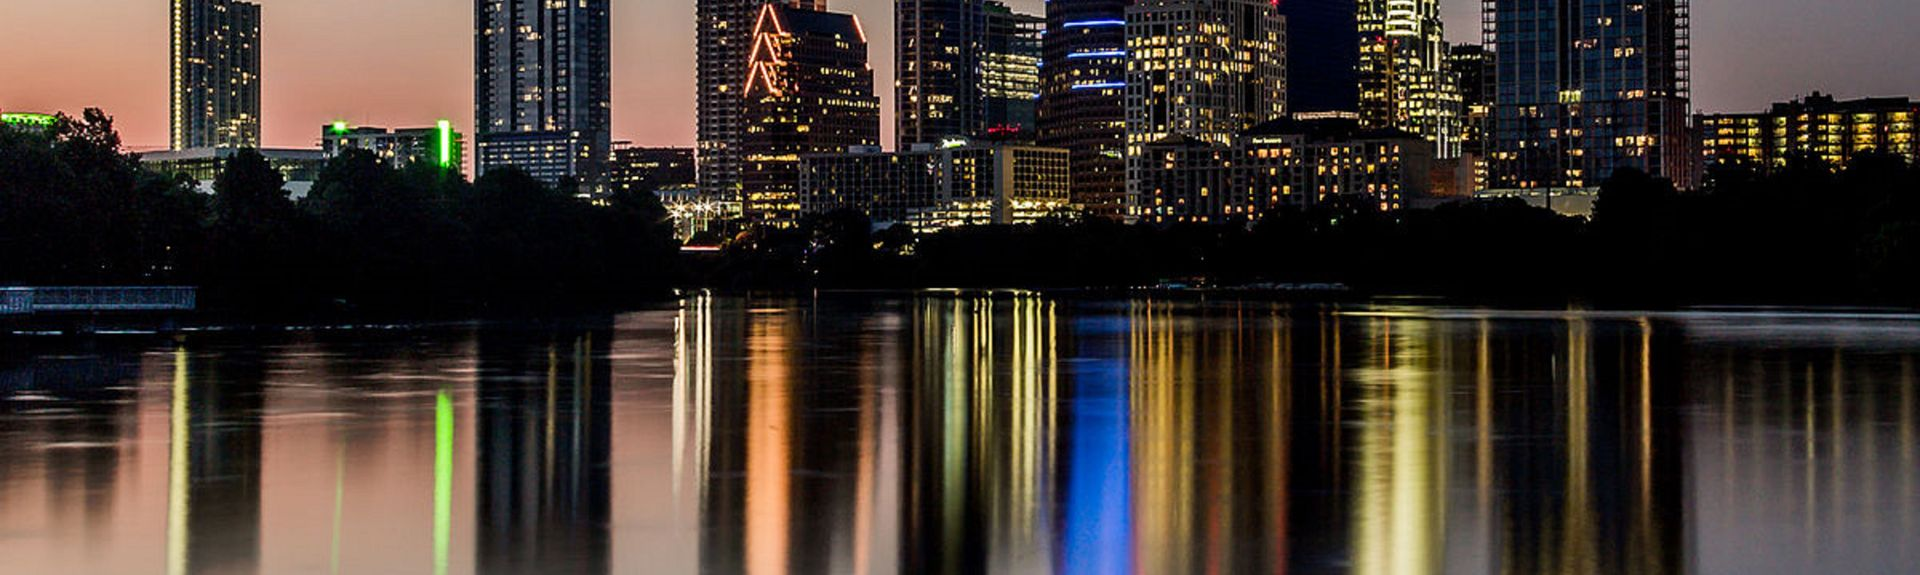 Clarksville, Austin, TX, USA